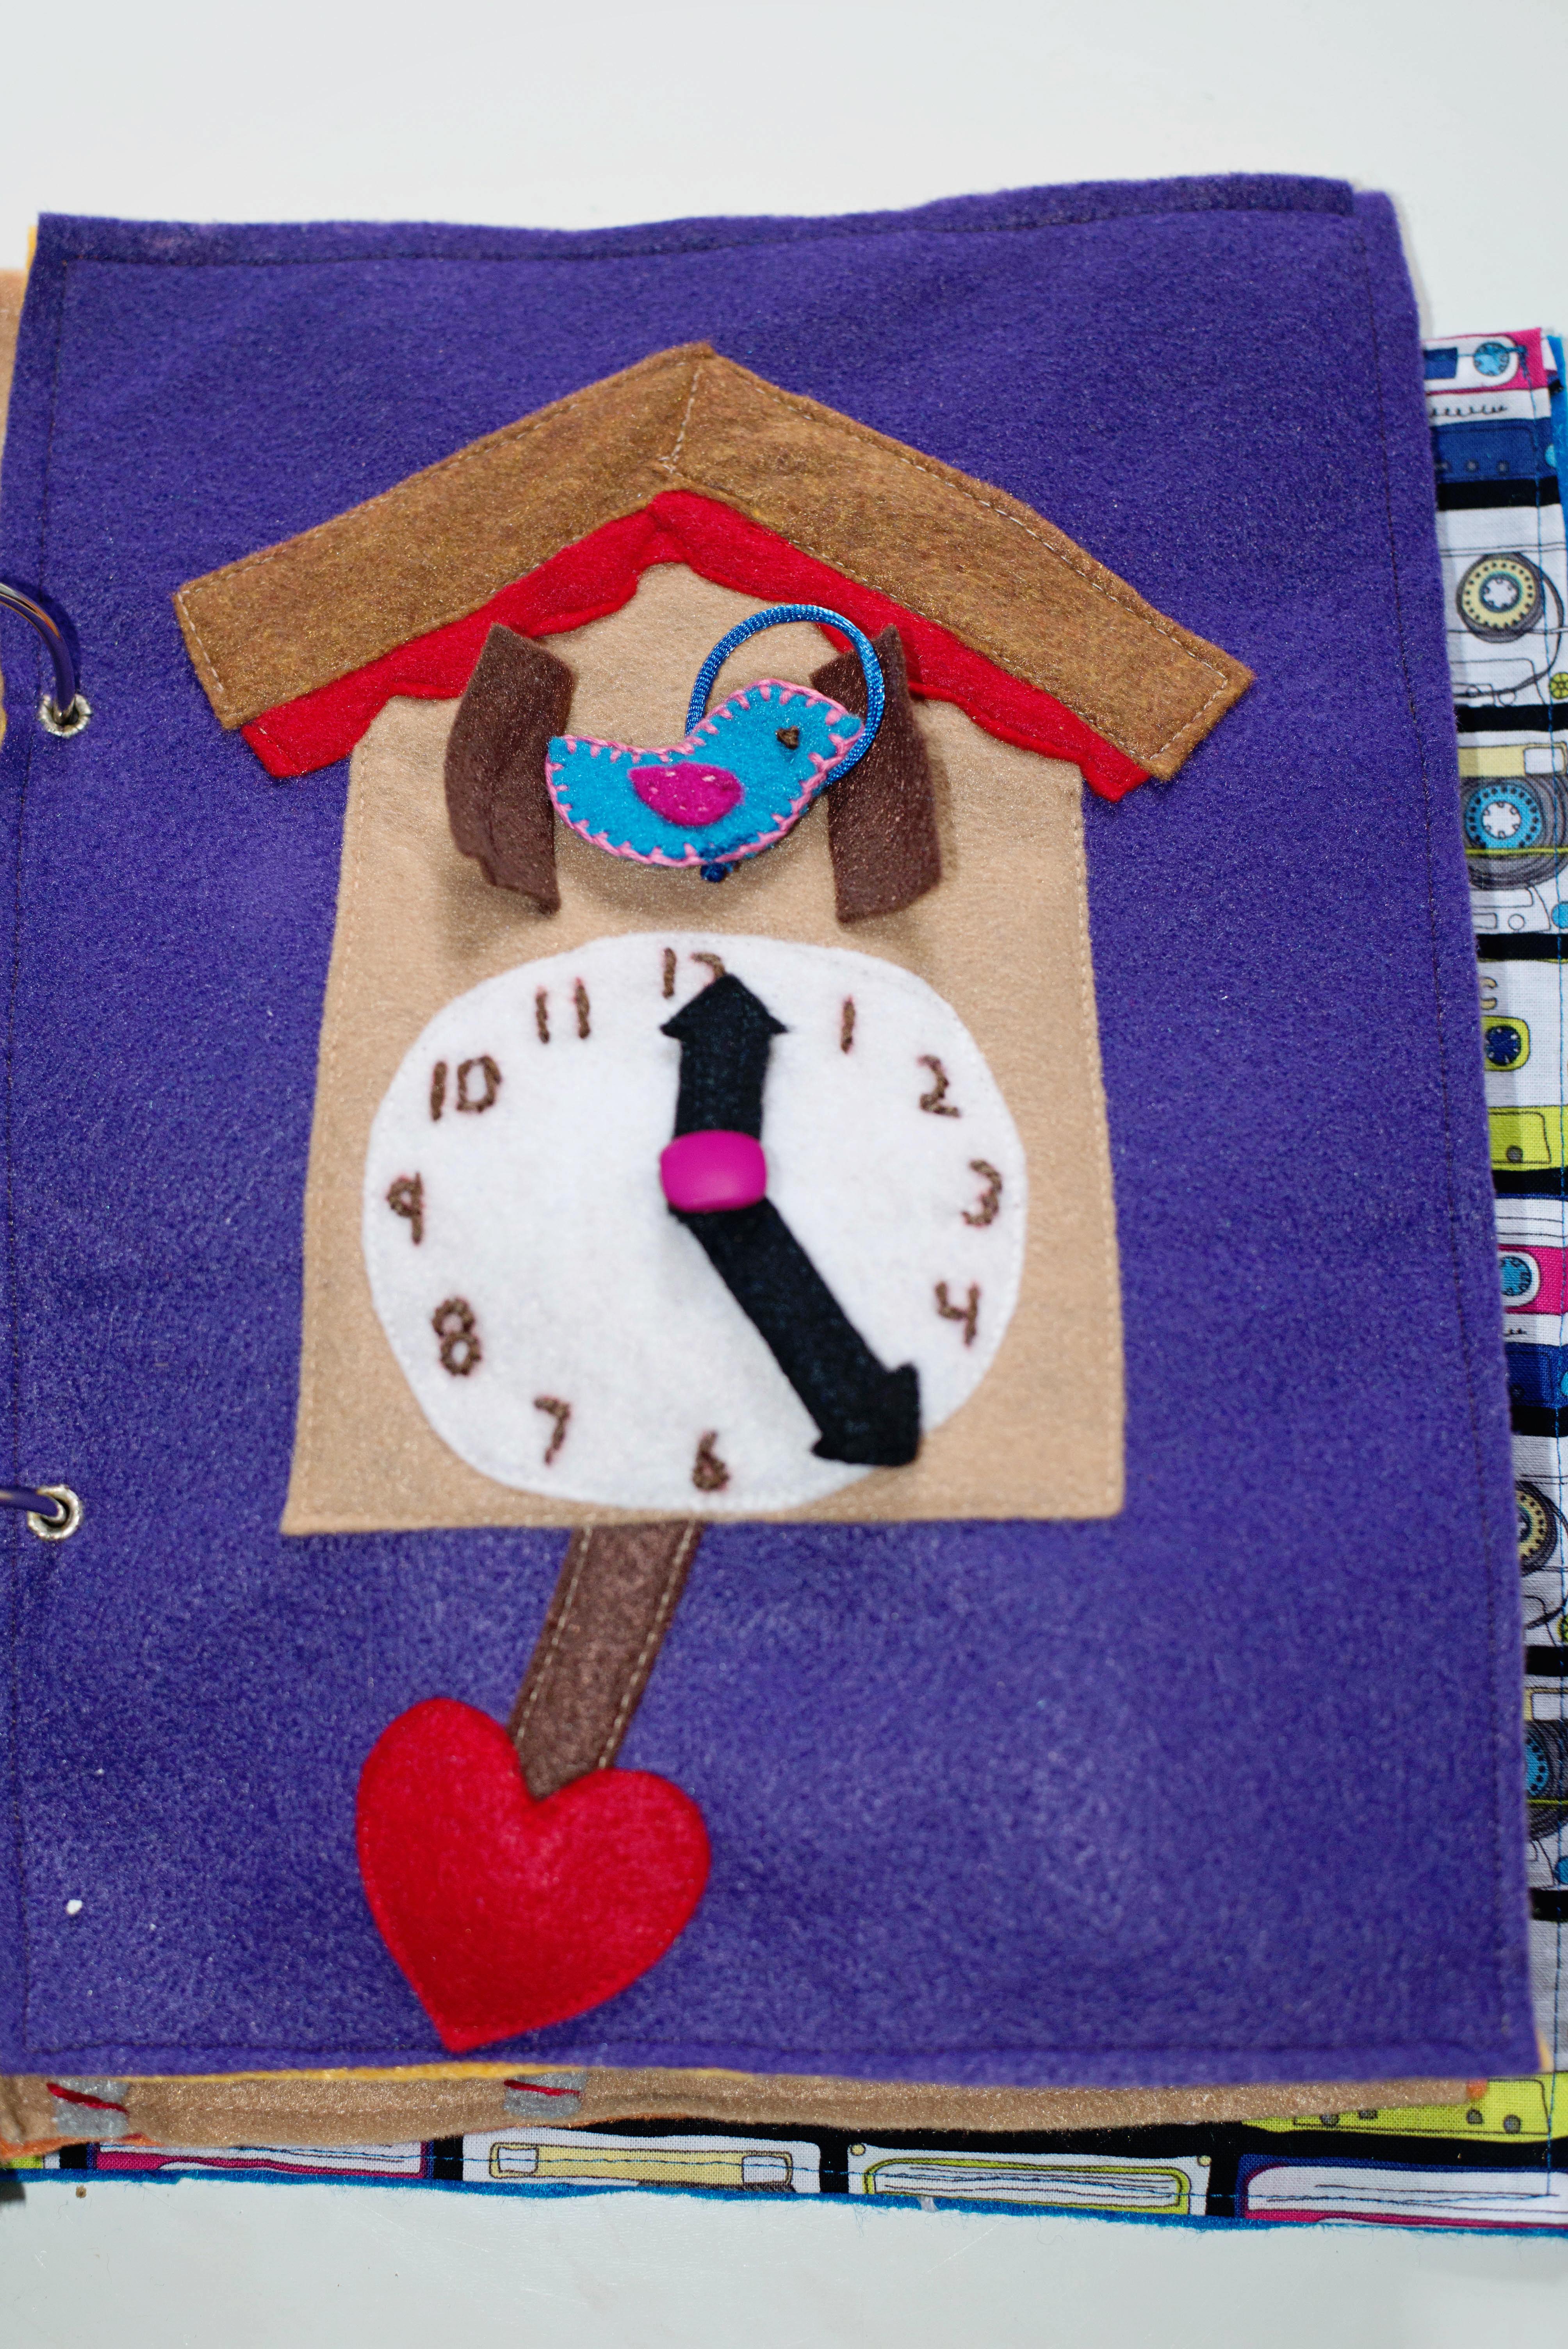 Babes in Deutschland, cuckoo clock time telling quiet book page